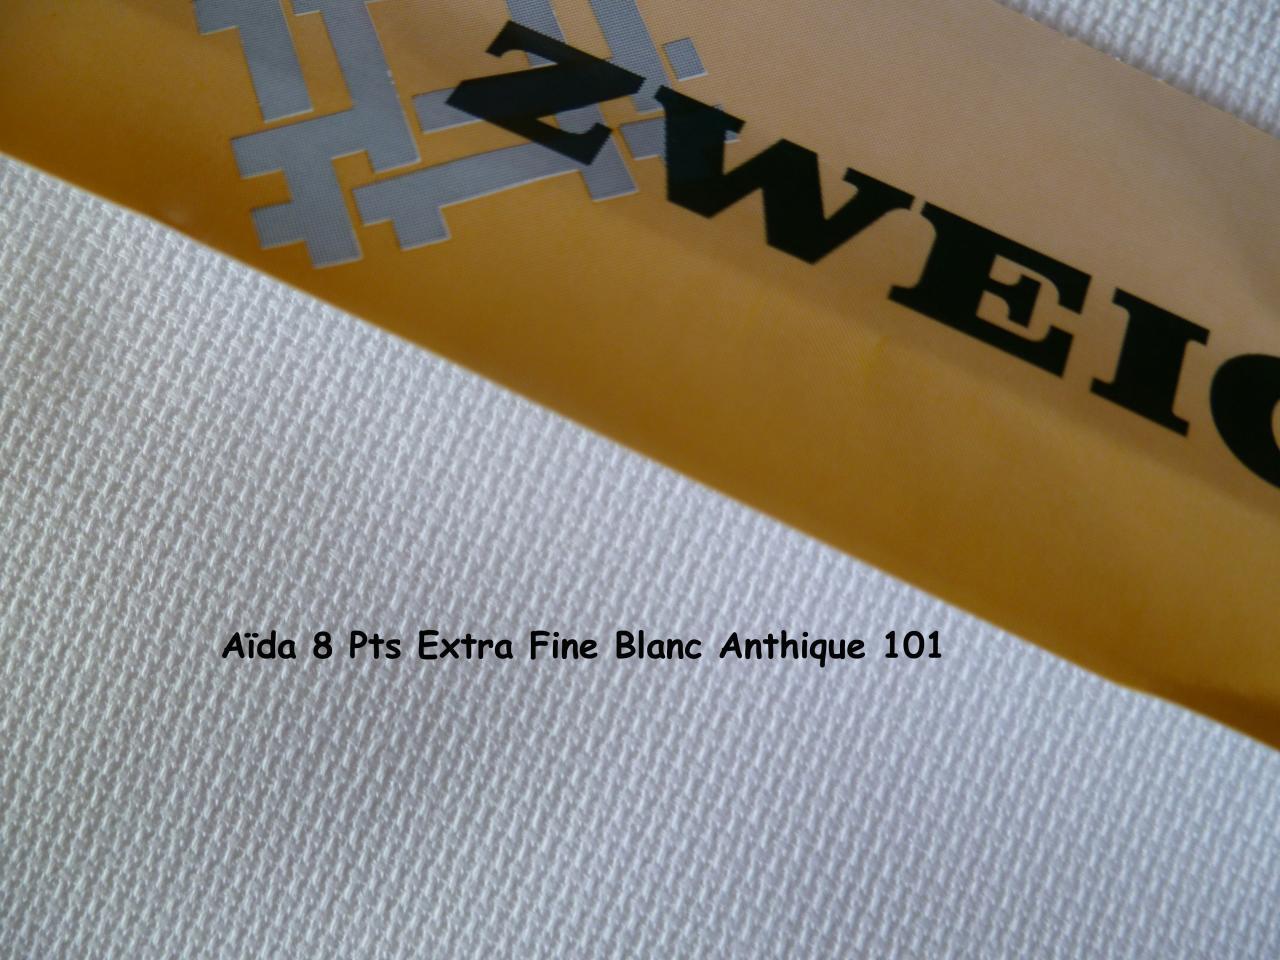 aida-extra-fine-8pts-101-blanc-anthique-1.jpg